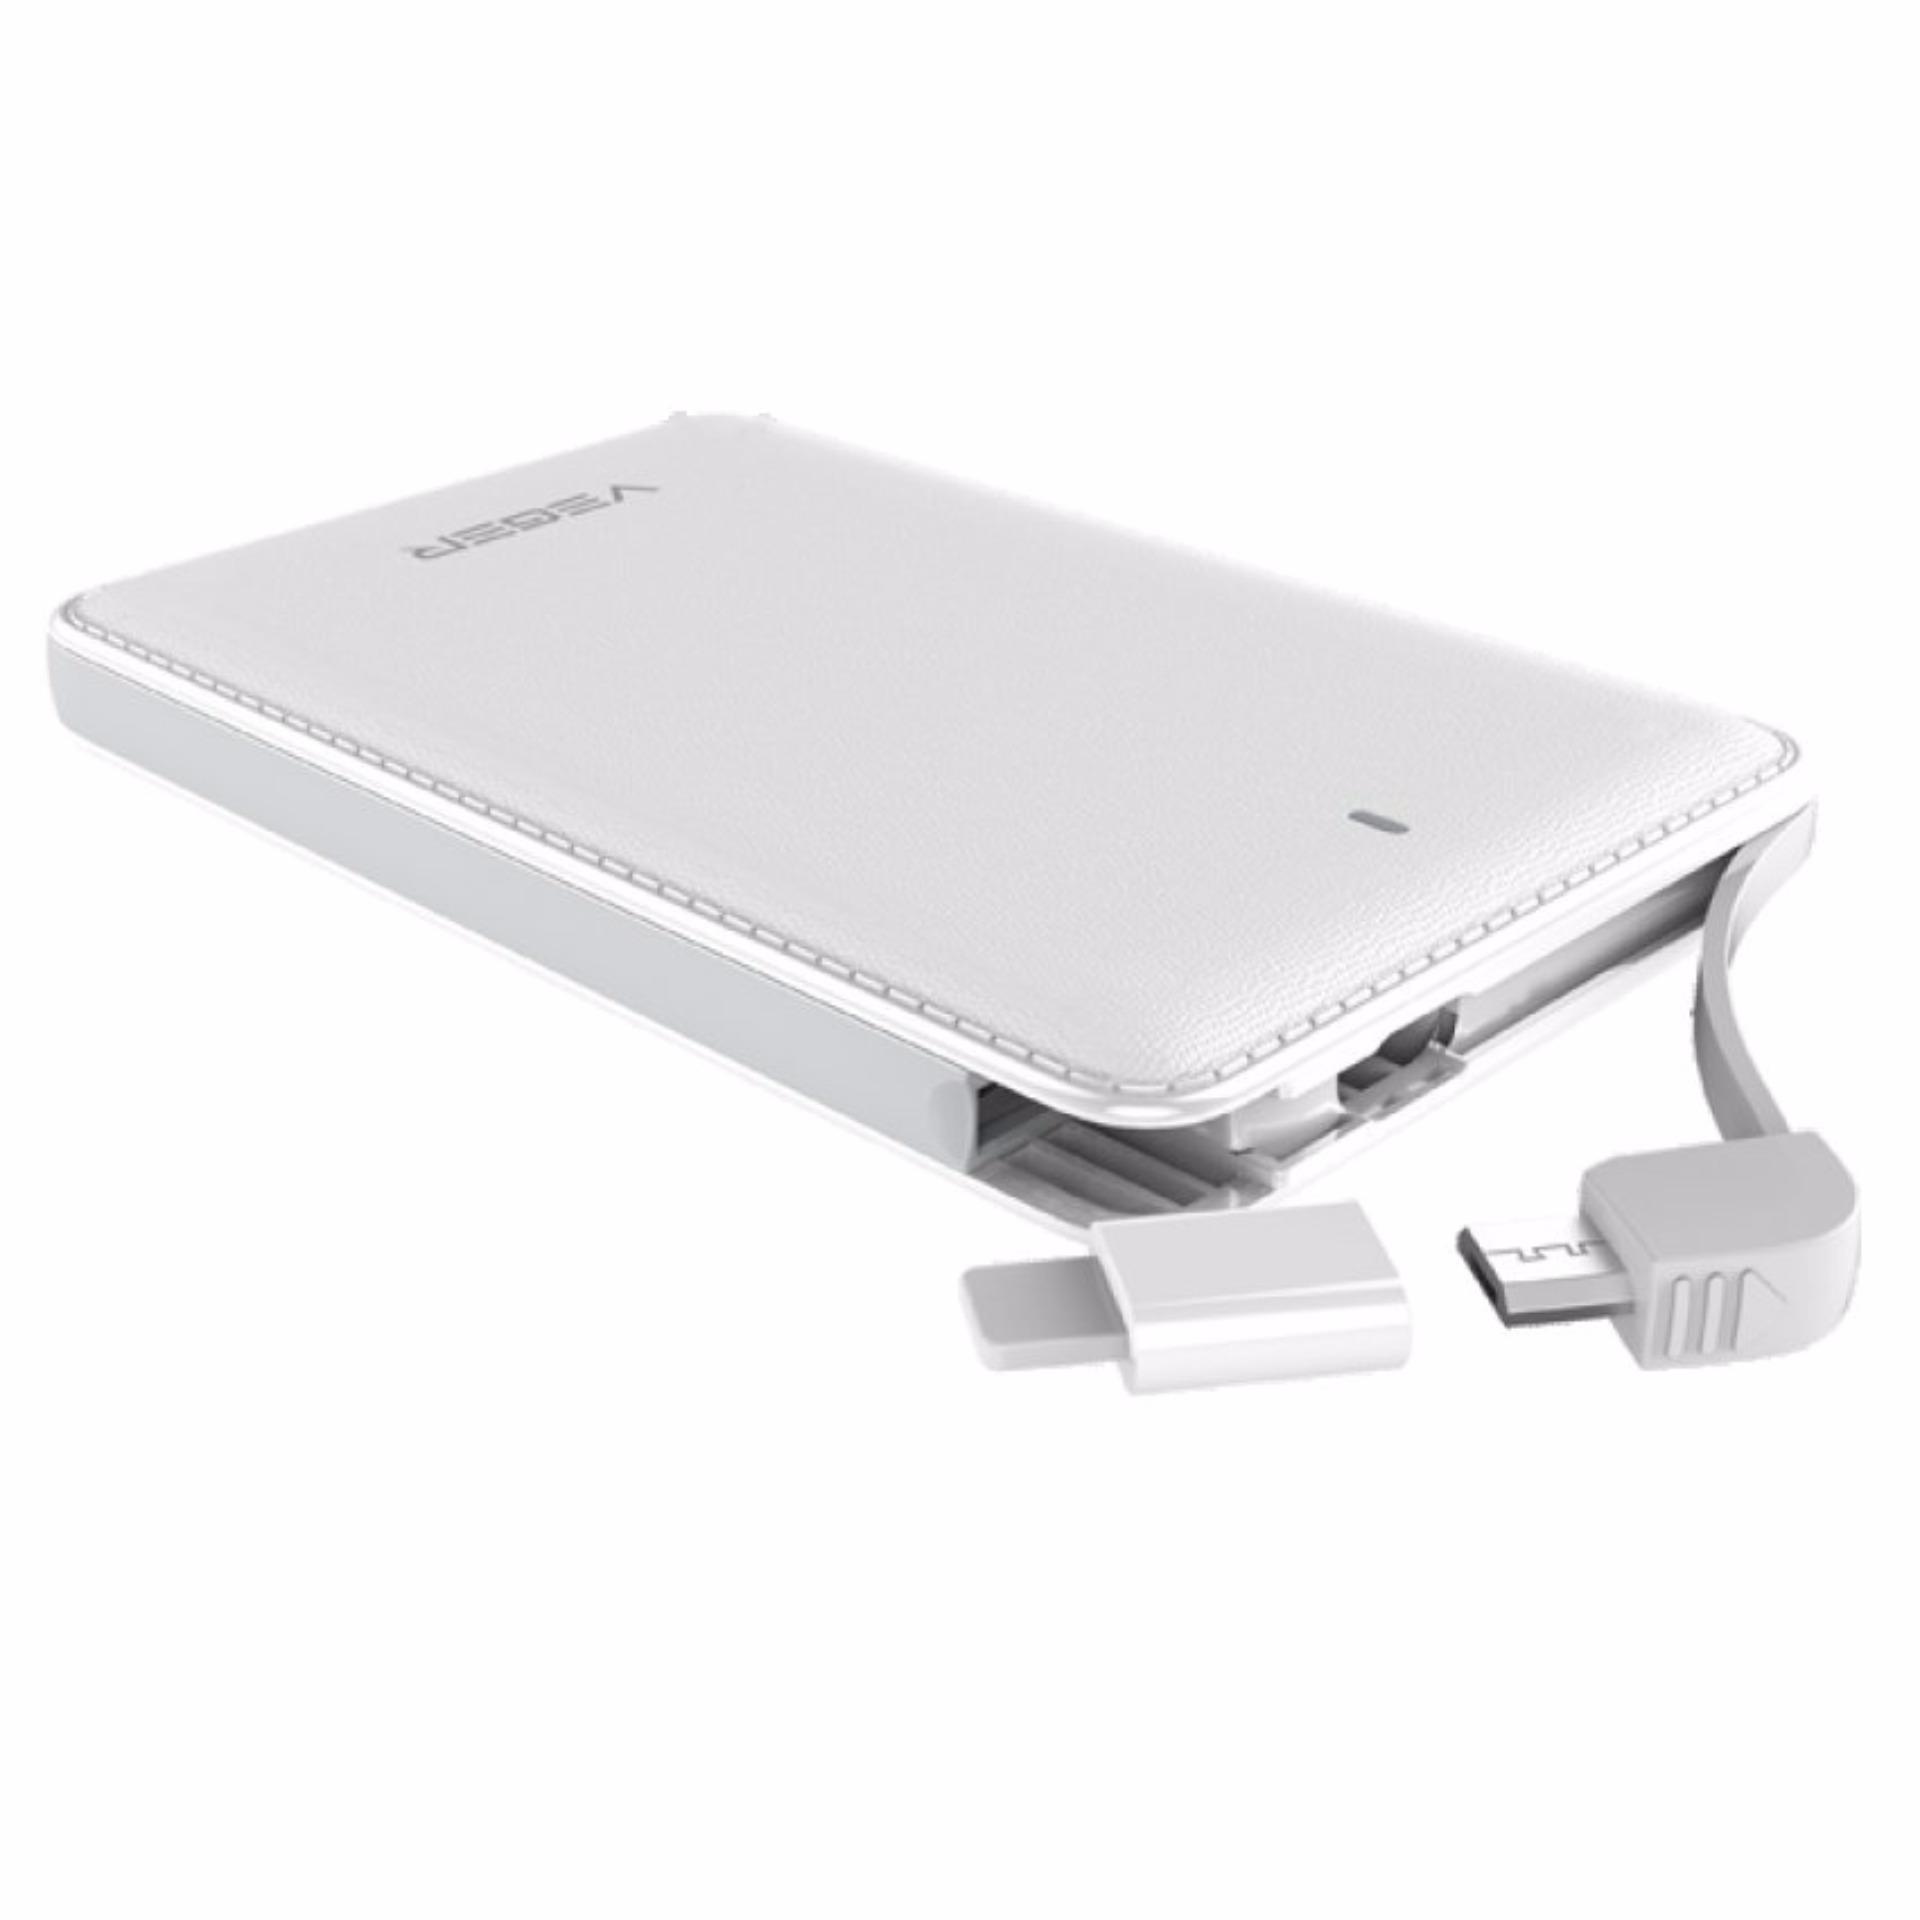 Kehebatan Hippo Power Bank Bronz X 10000 Mah Real Kapasitas Putih 15000 Garansi Resmi Grey Veger V41 Series Original Hologram